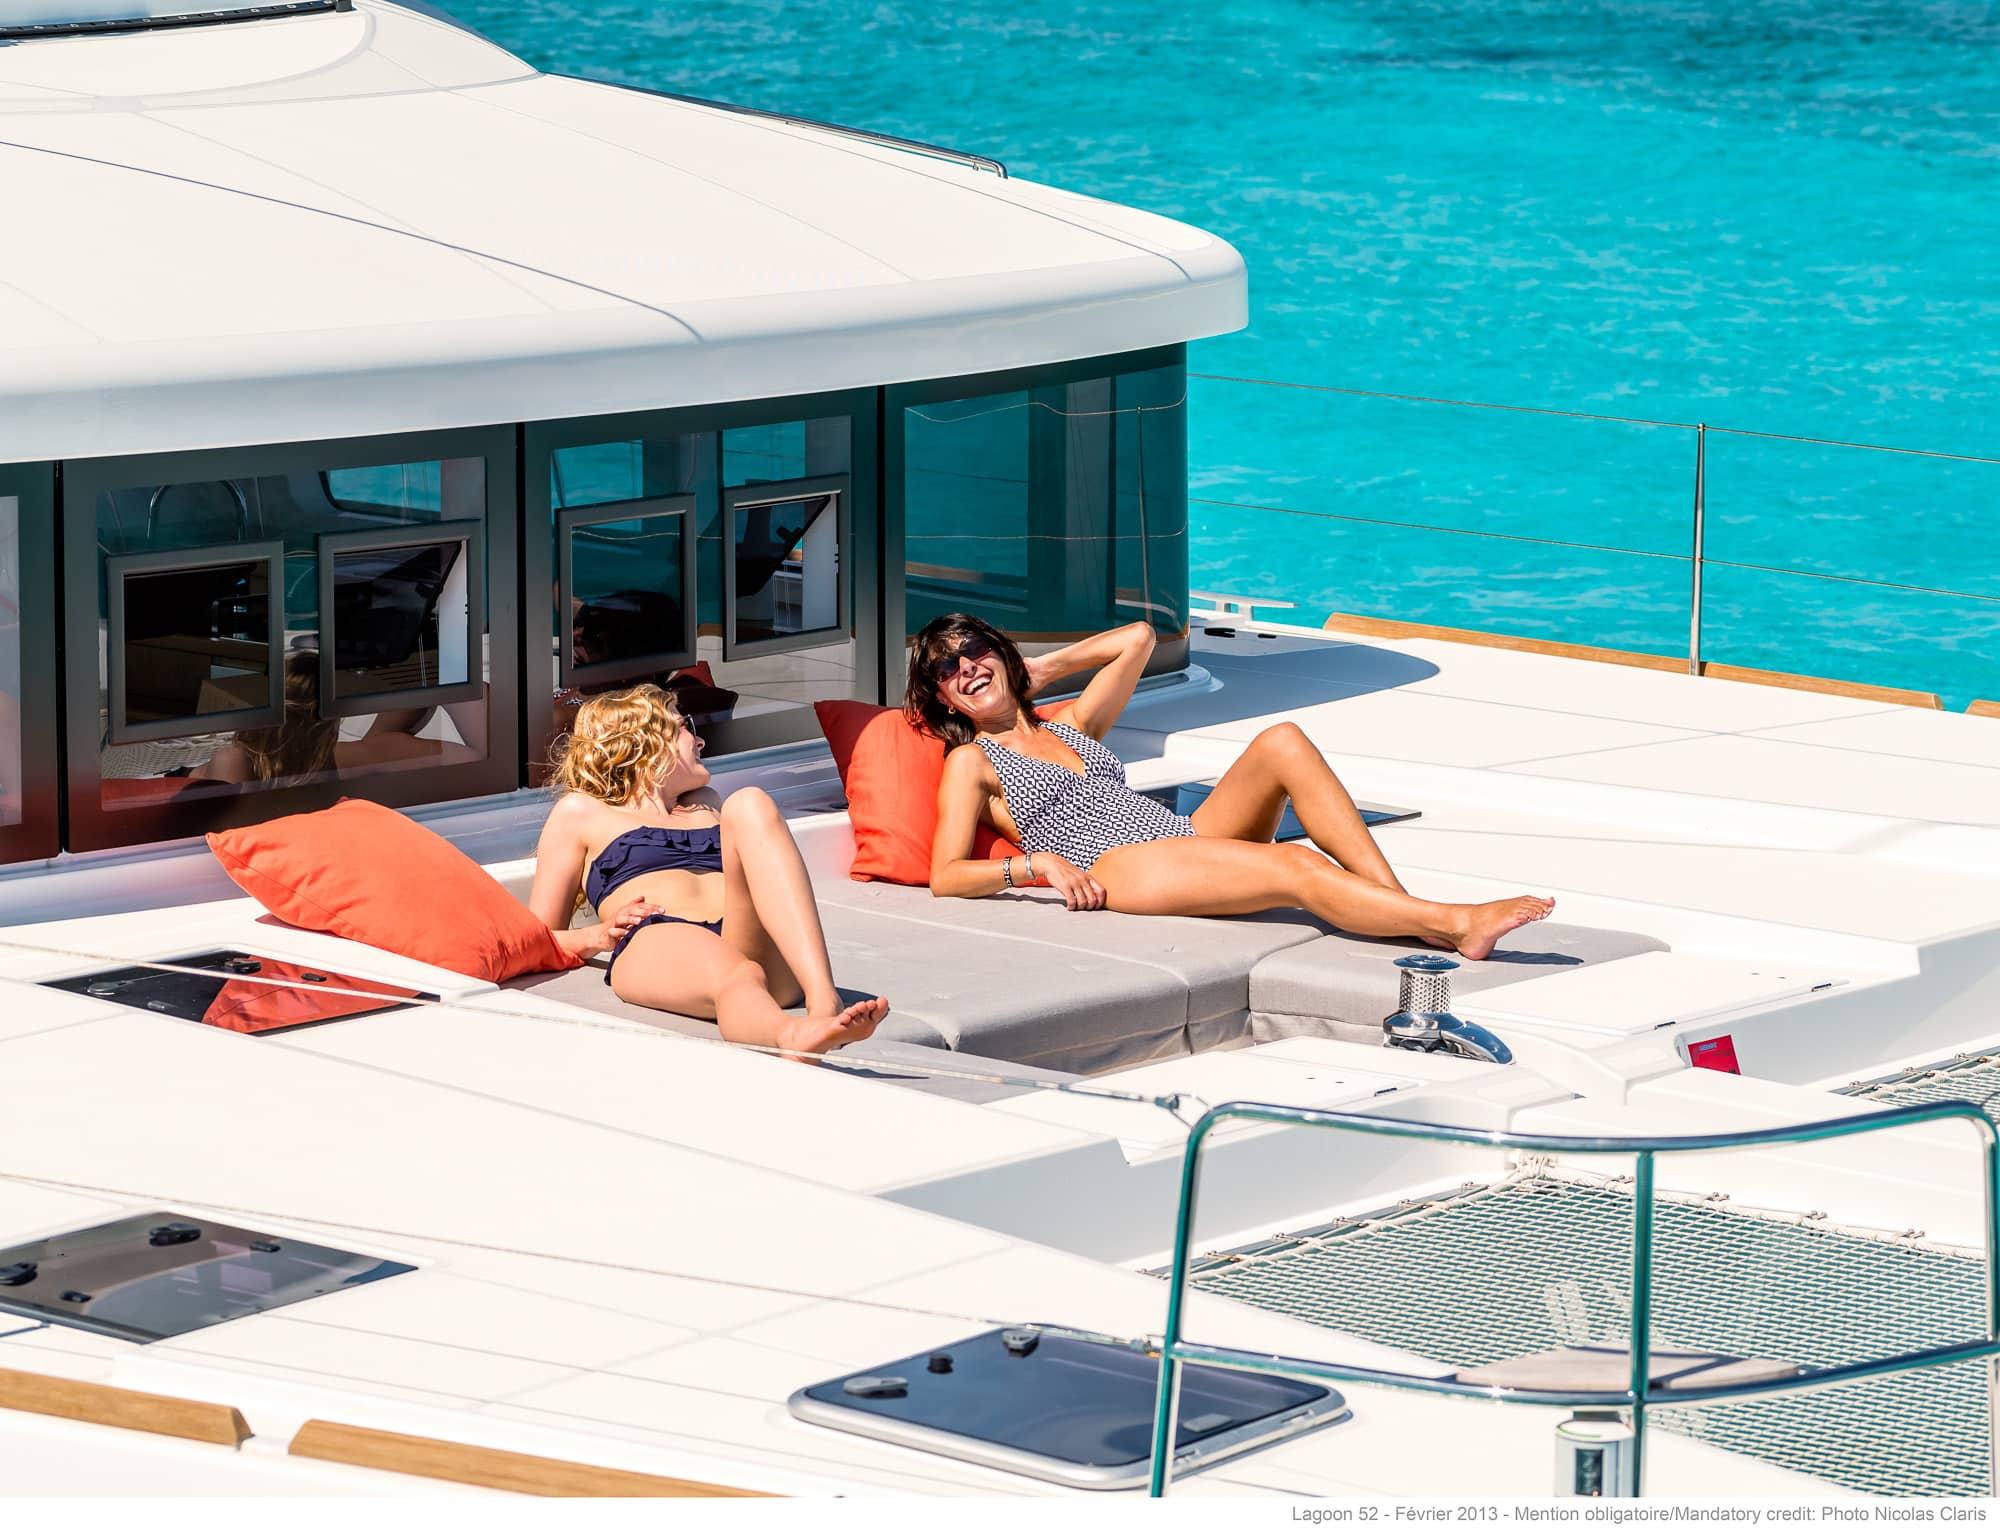 lagoon 52 f-yacht-charter-croatia-sailing-holidays-croatia-booking-yacht-charter-croatia-catamarans-sailboats-motorboats-gulets-luxury-yachts-boat-rental-croatia 7